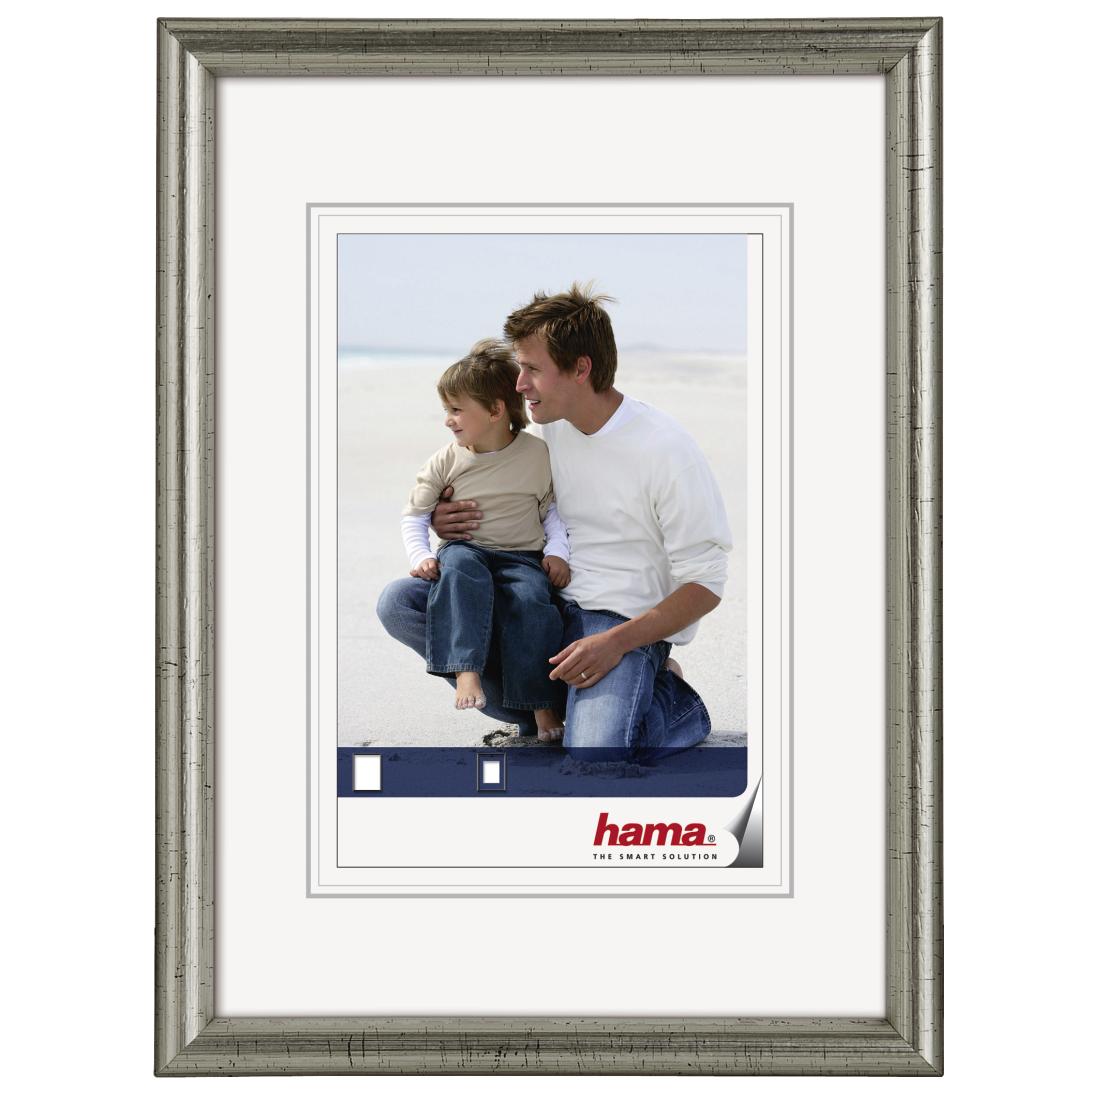 00064902 Hama Wooden Frame \